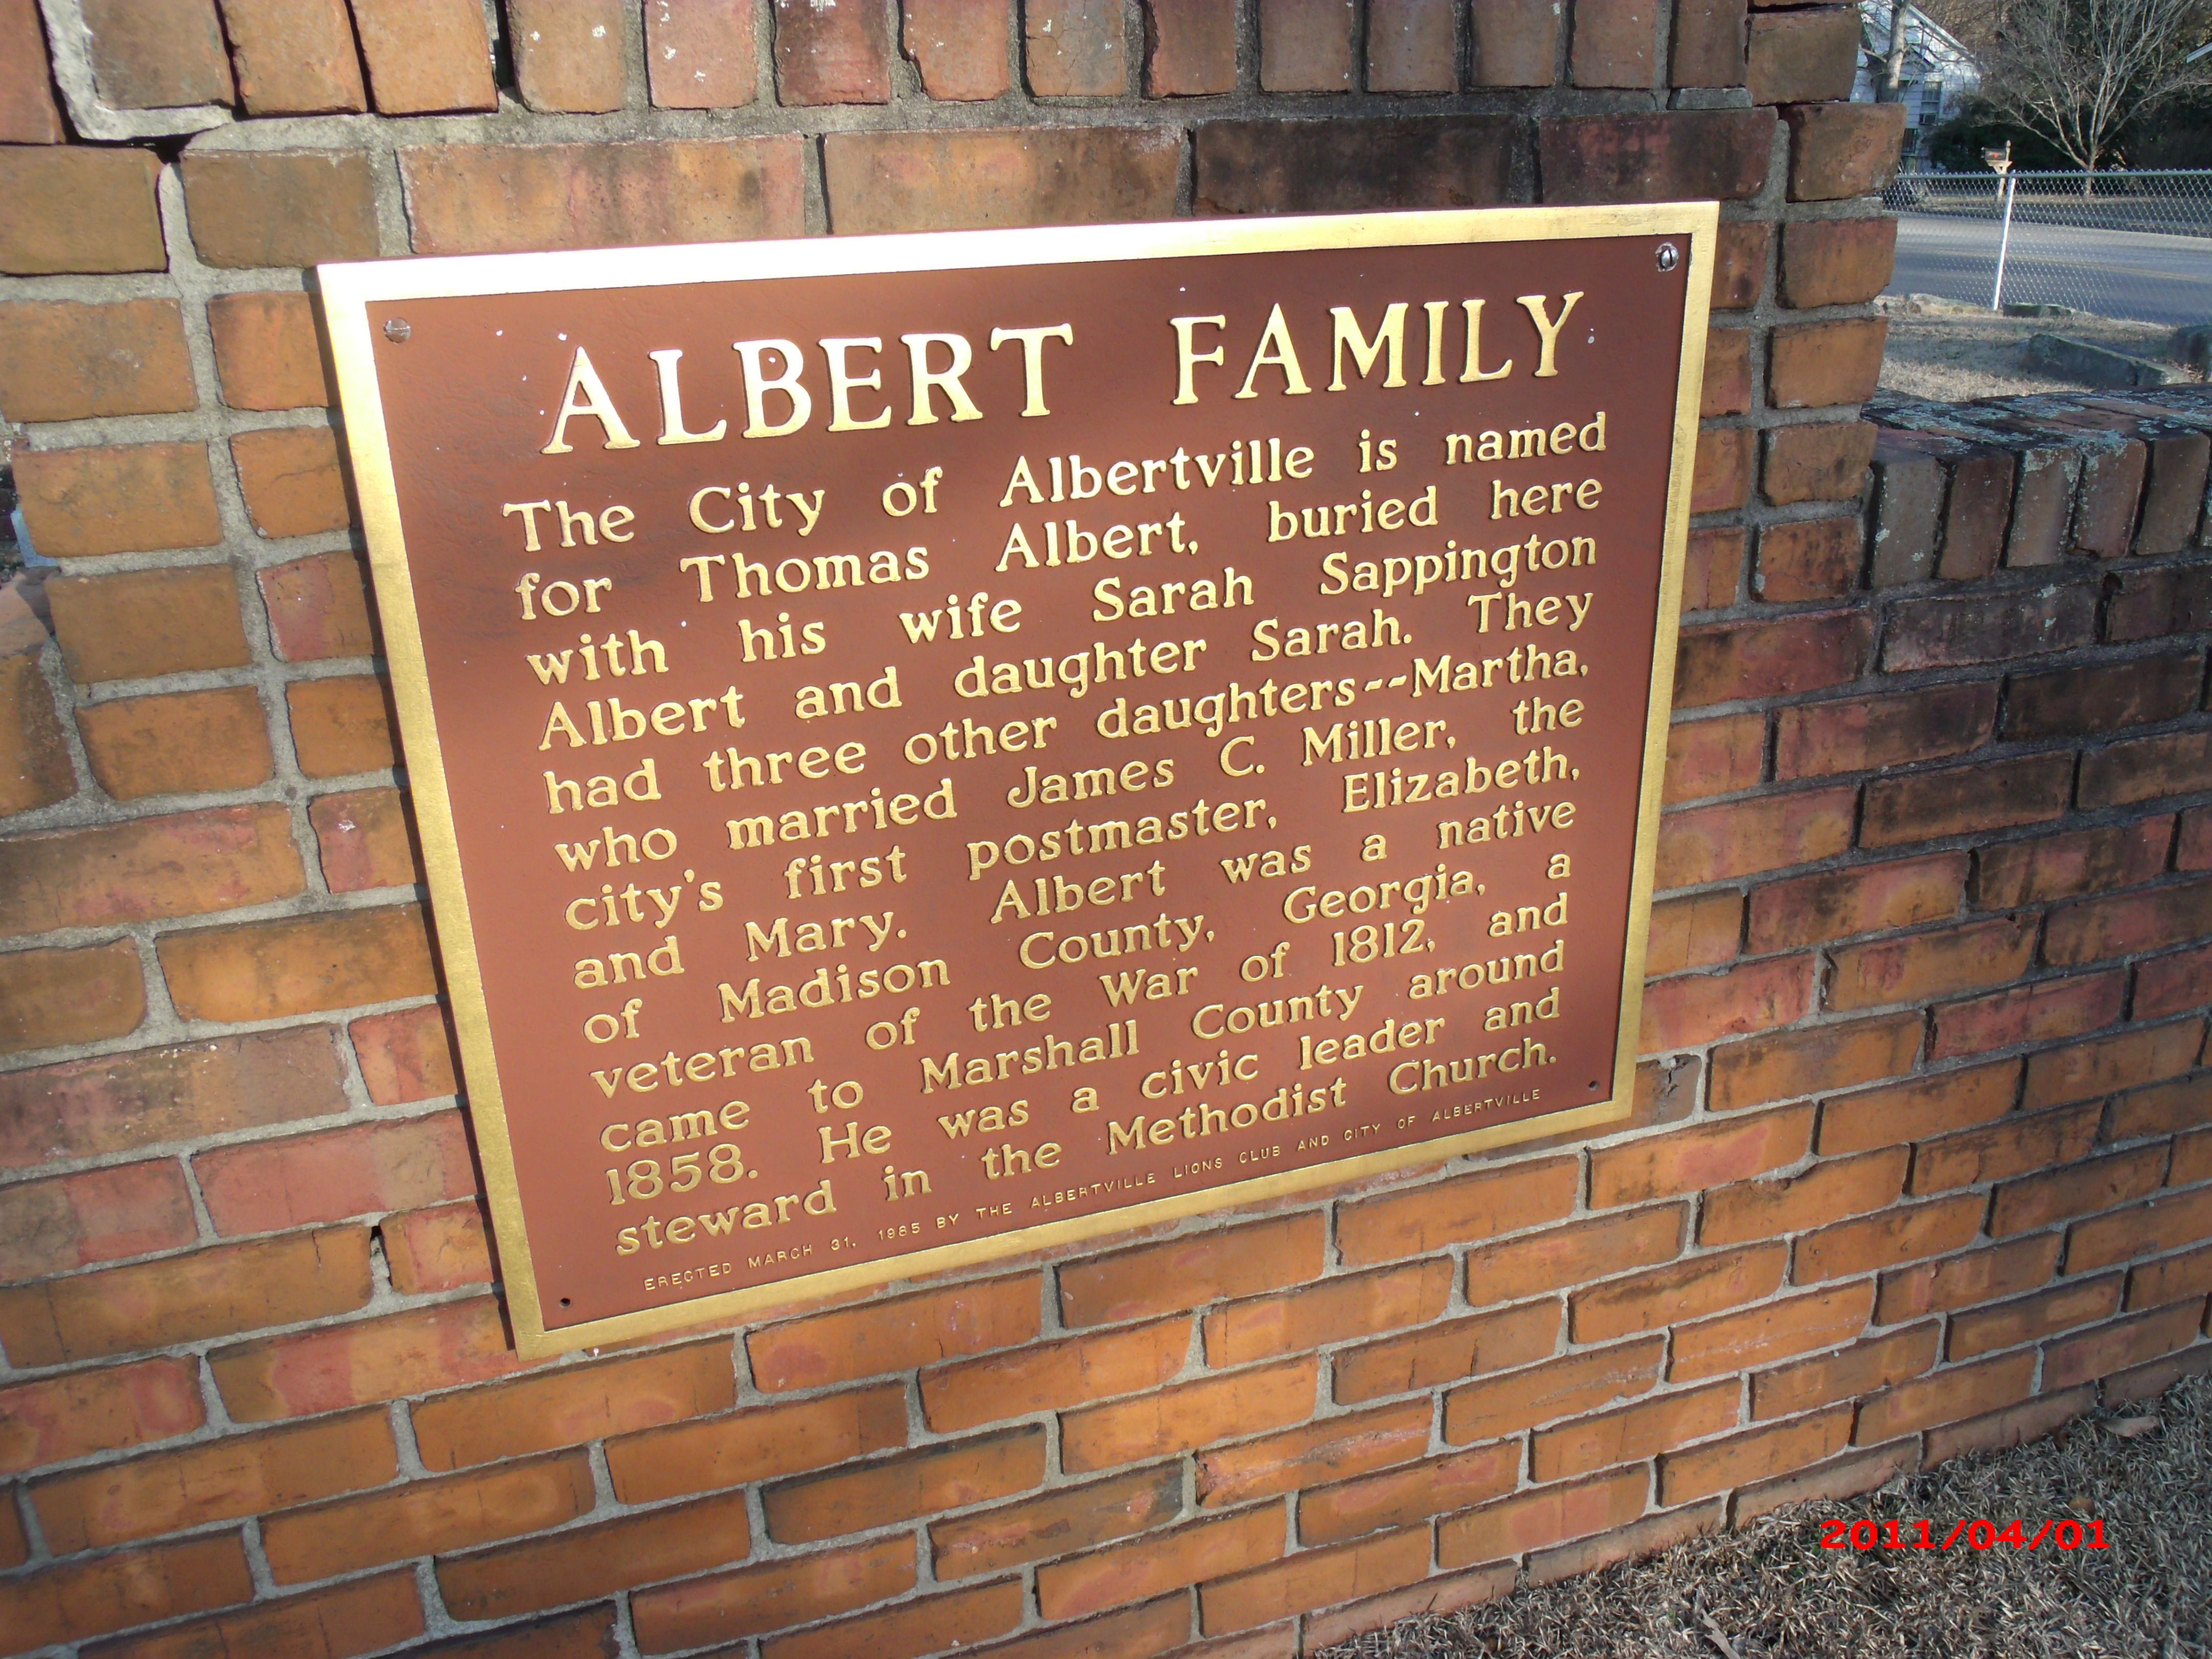 Colormaster albertville al - Plaque On Albert Family Gravesite Old Albertville Cemetery Albertville Alabama